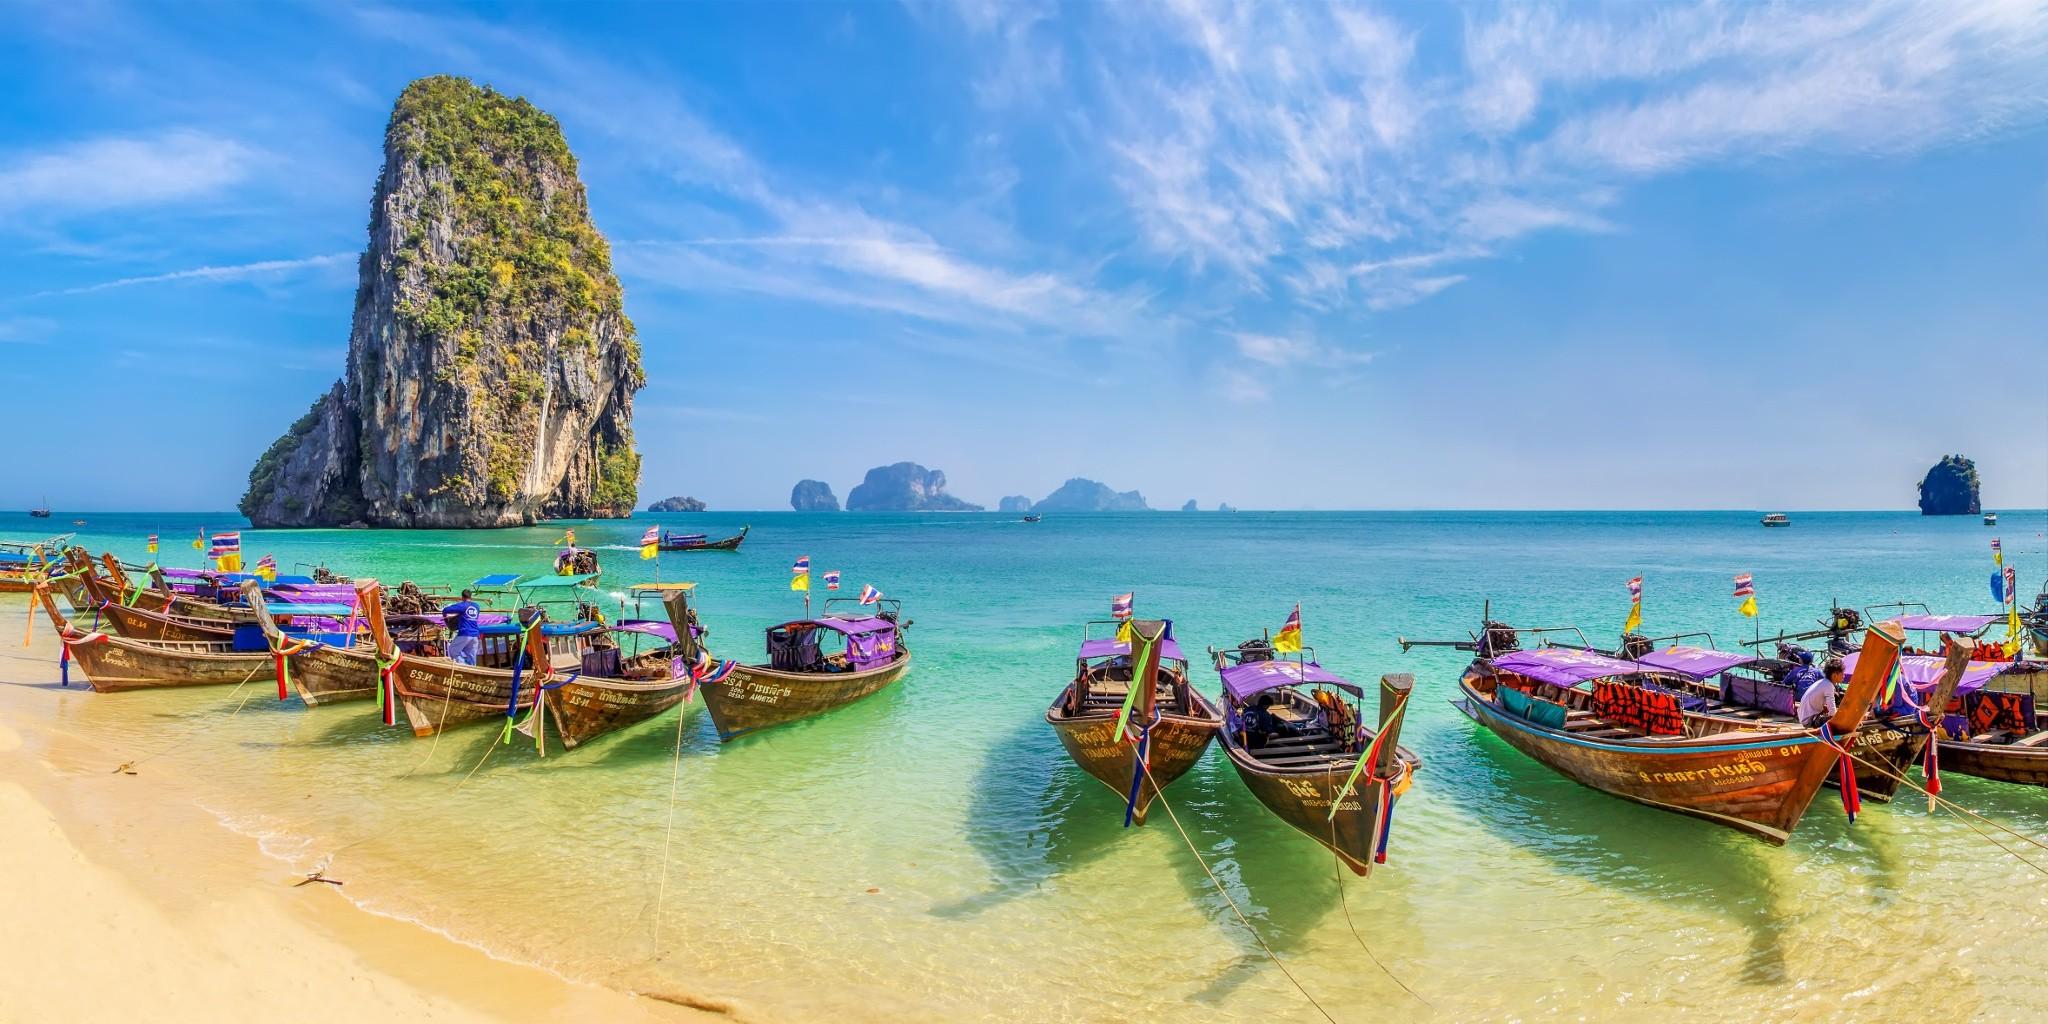 Wallpaper : Landscape, Sea, Bay, Nature, Sand, Sky, Beach, Tourism, Coast,  Tropical, Turquoise, Island, Lagoon, Summer, Thailand, Caribbean, Vacation,  ...